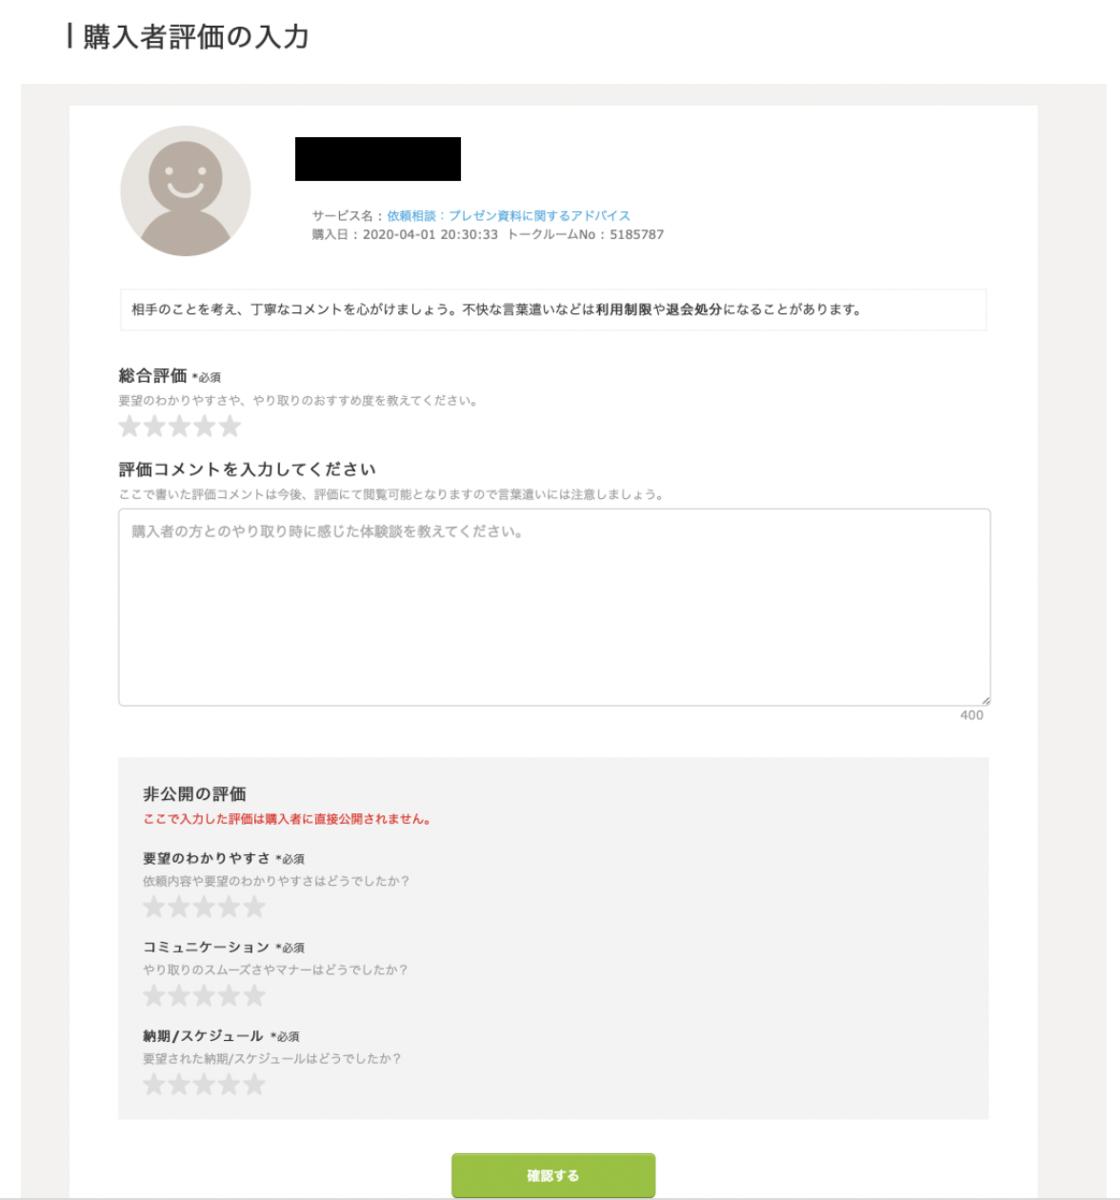 f:id:presen-sen-nin:20200411151824p:plain